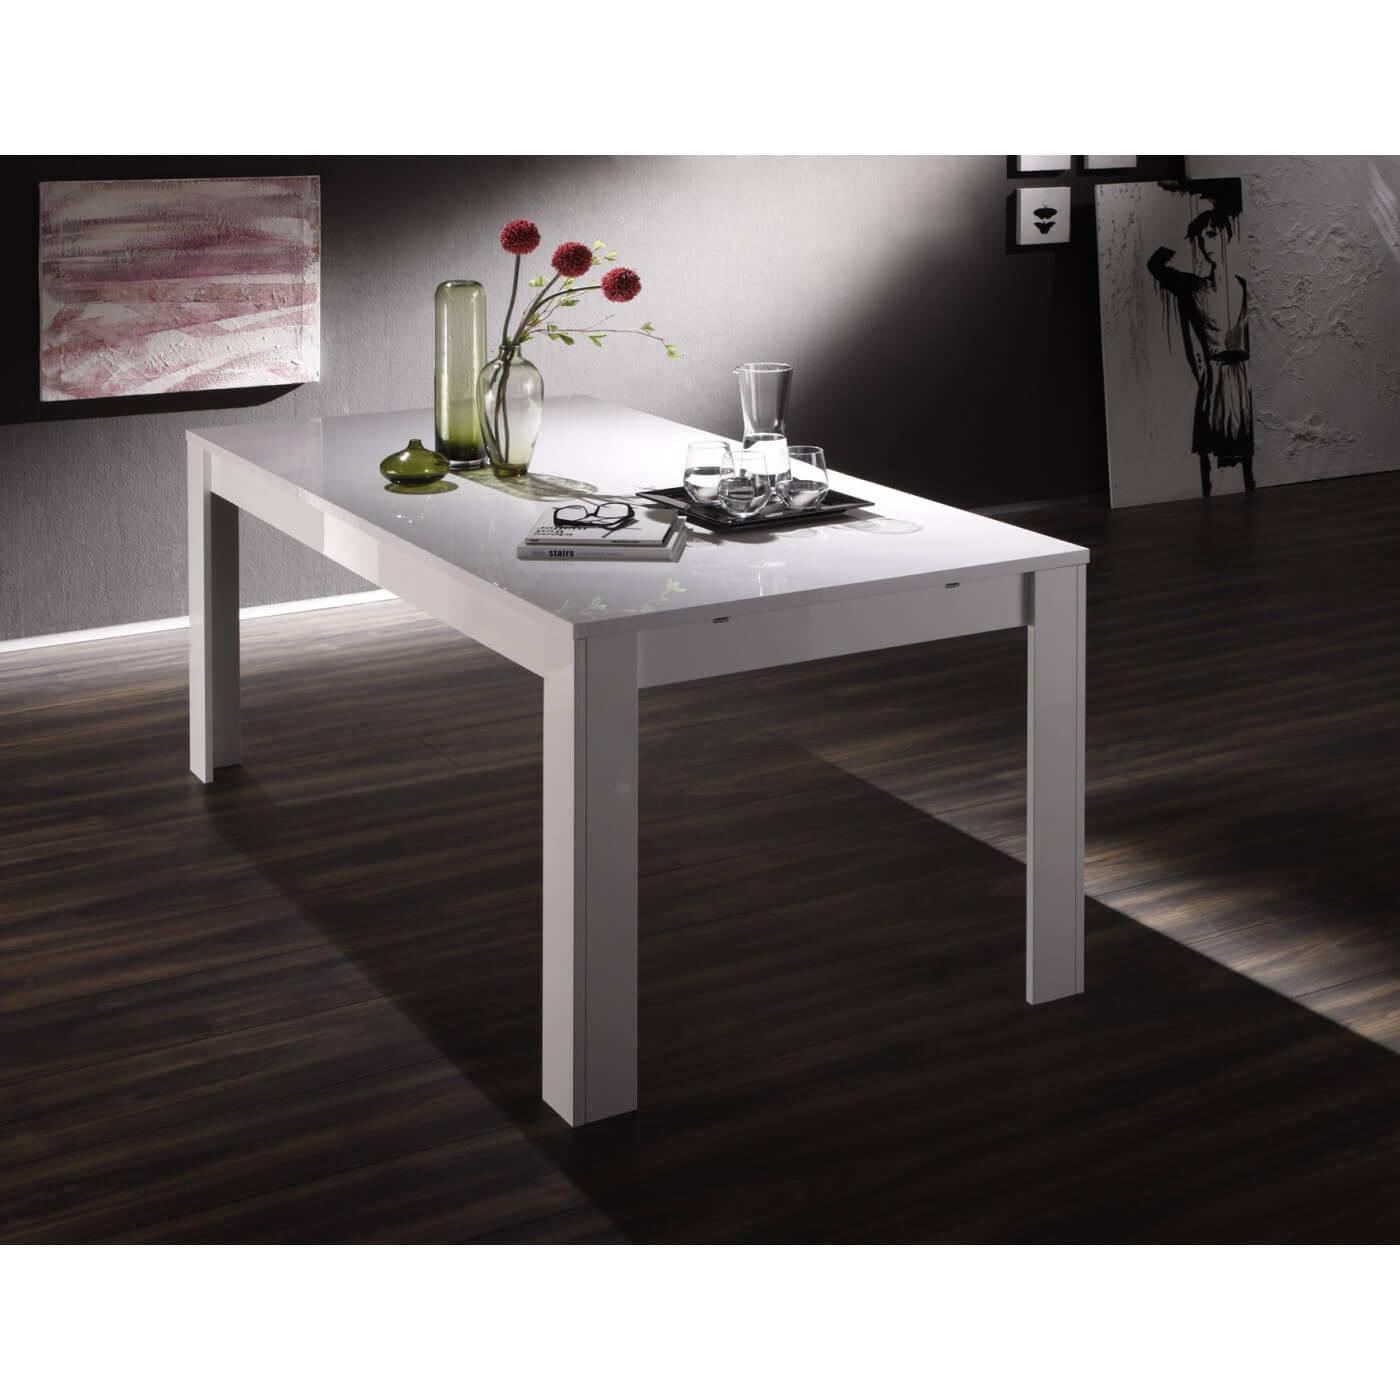 Table de salle manger design laqu blanc judy matelpro - Table salle a manger design ...